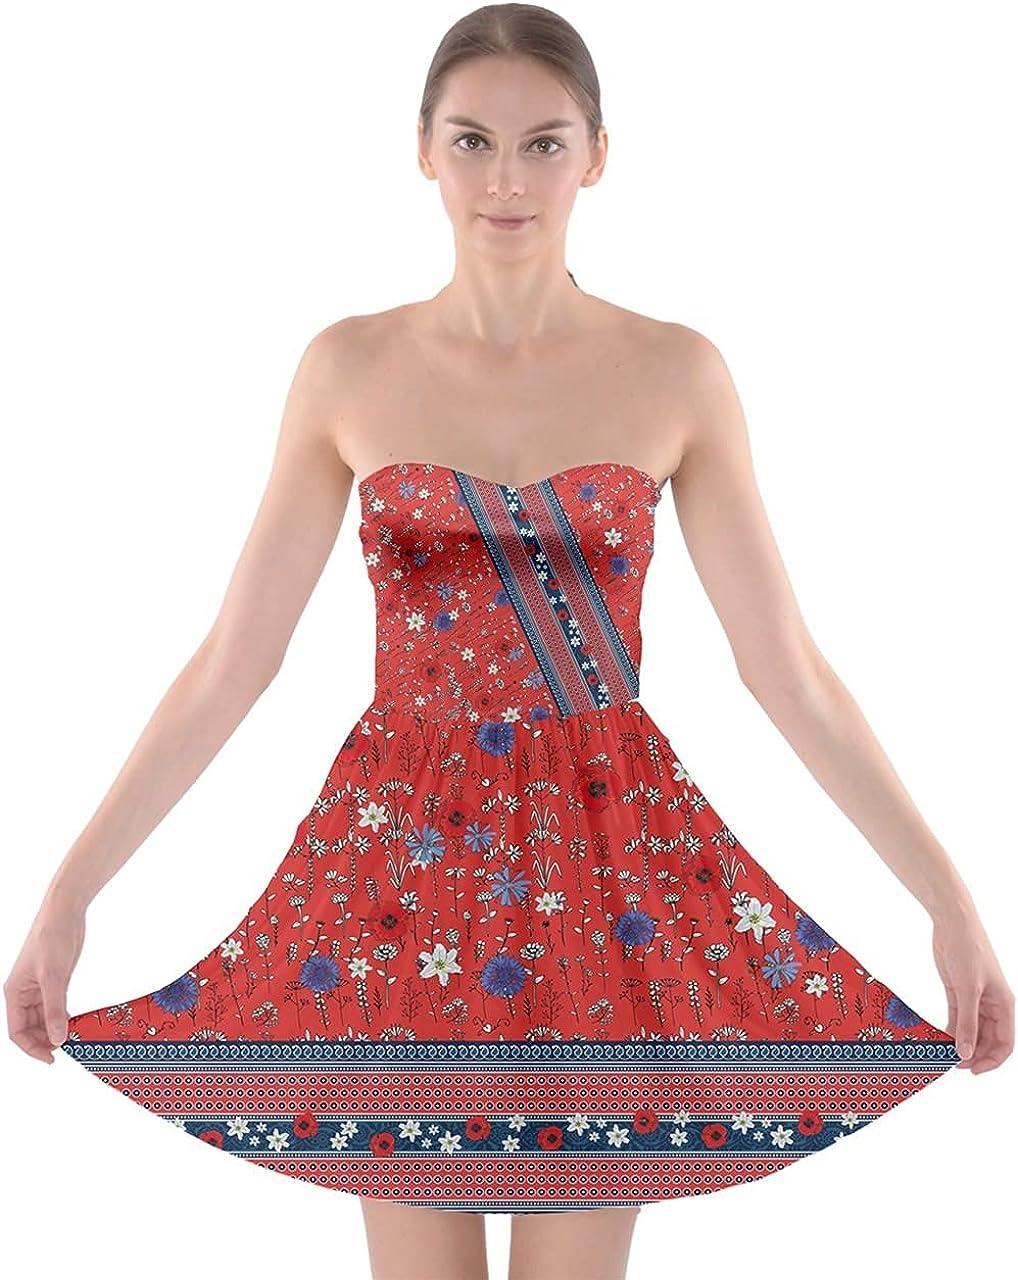 CowCow Womens Strapless Tube Top Dress Summer Frangipani Floral Sexy Bra Top Dress, XS-5XL